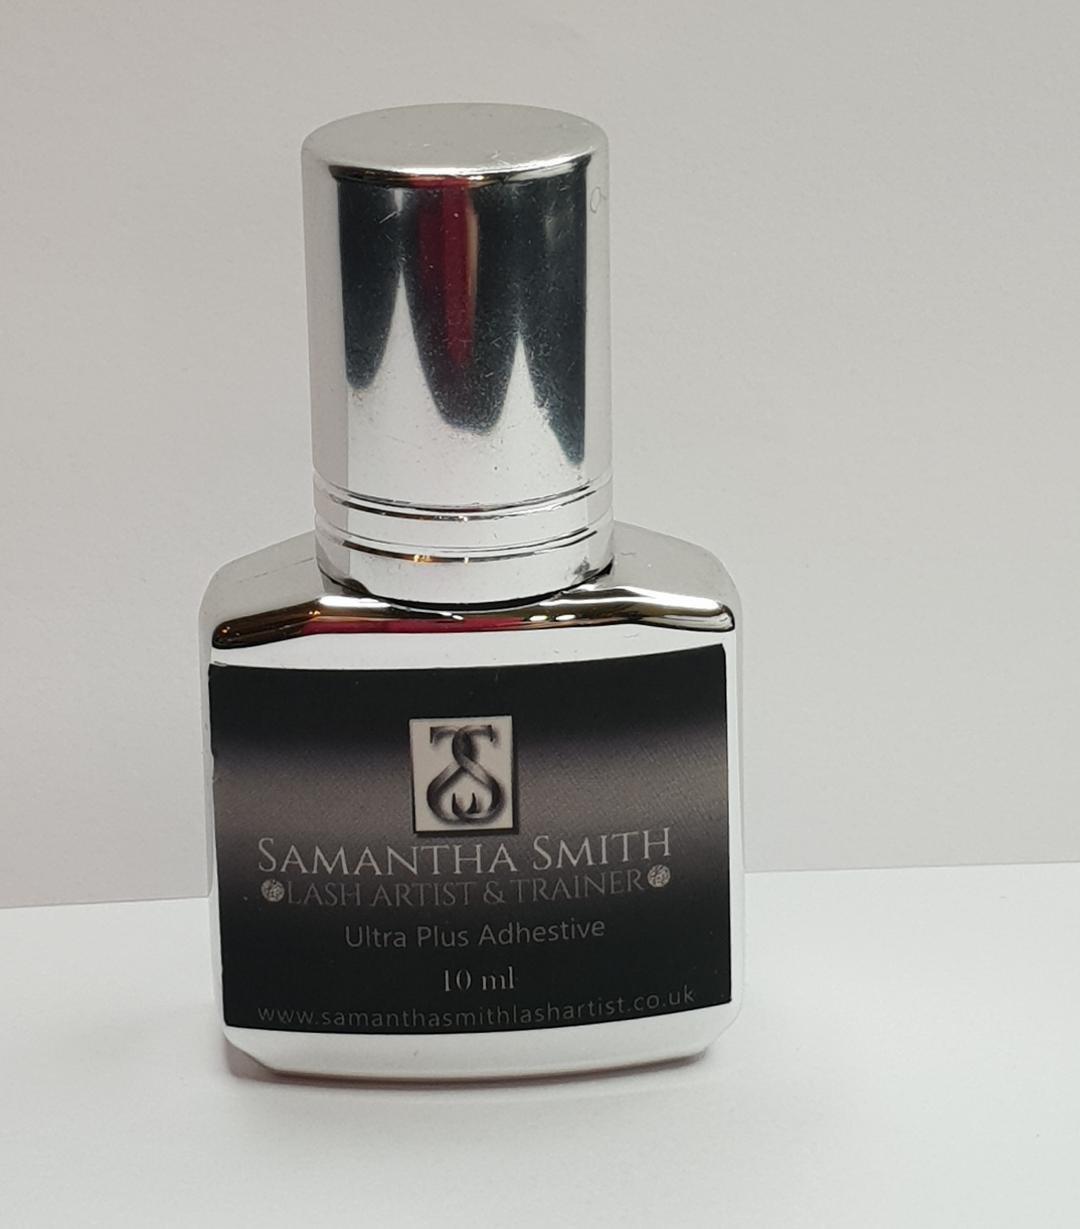 Ultra Plus Eyelash Adhesive Silver Top 10ml (Extreme Hold)